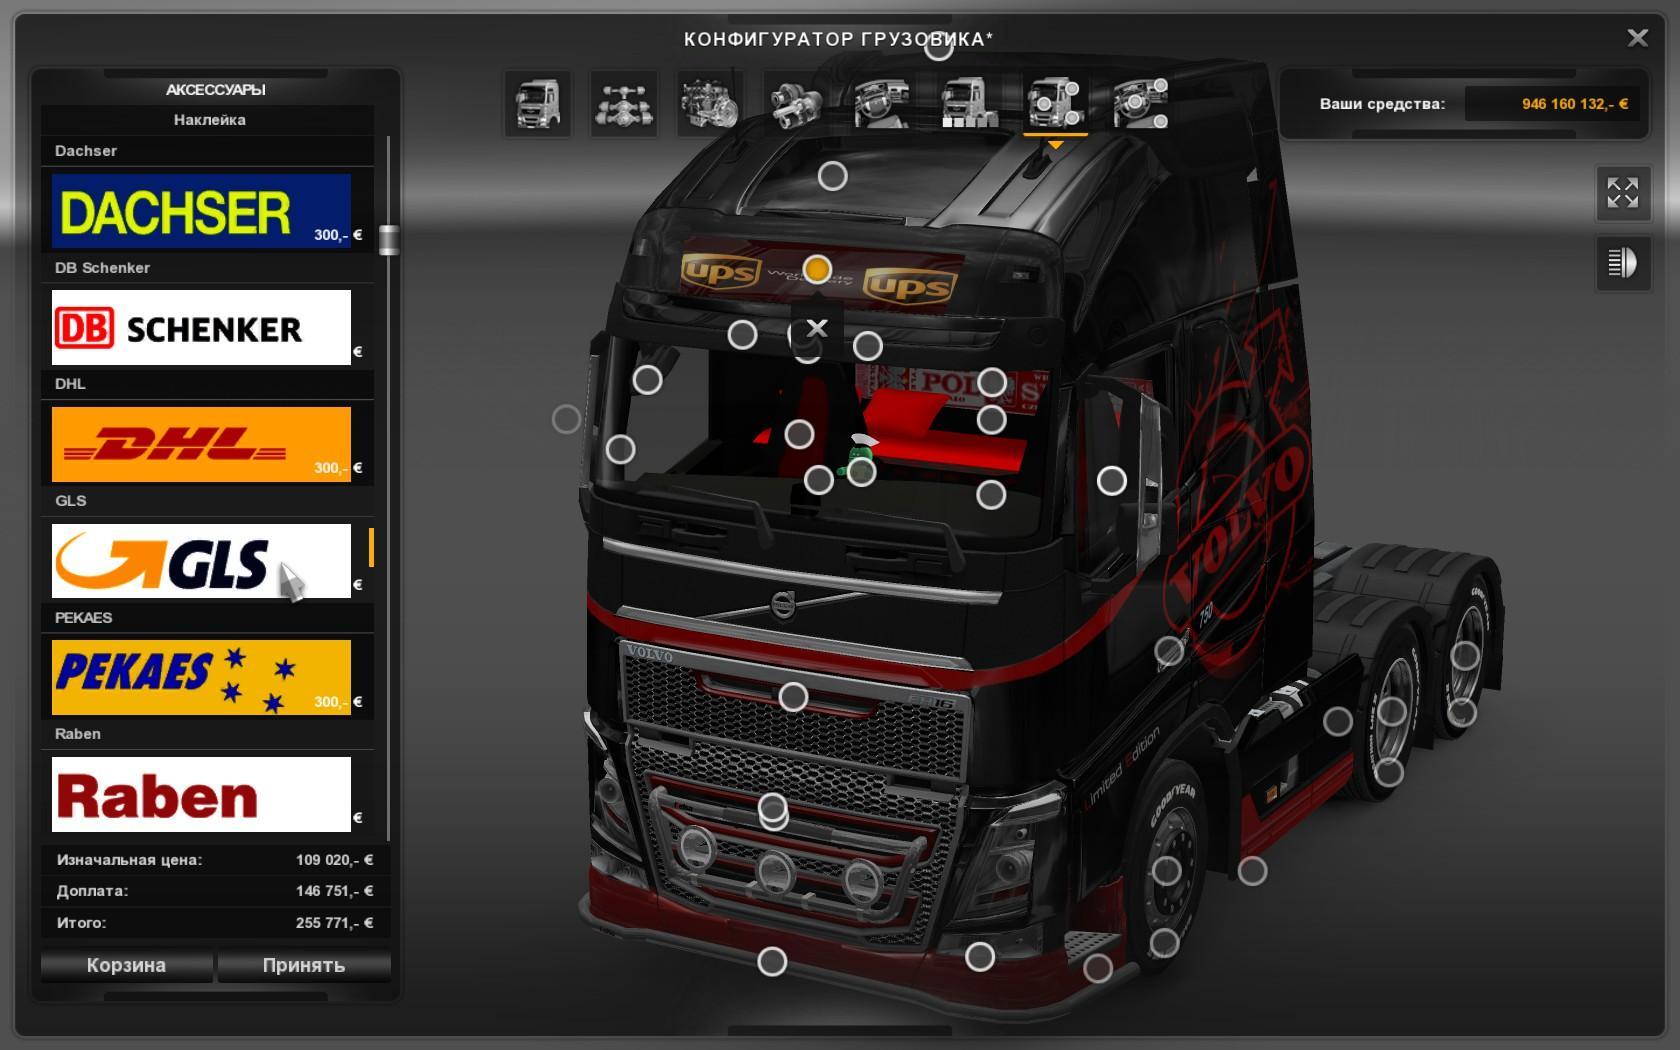 Volvo Fh 2012 Mtp Mega Tuning 122 Mod Euro Truck Simulator 2 Mods Vn Wiring Harness